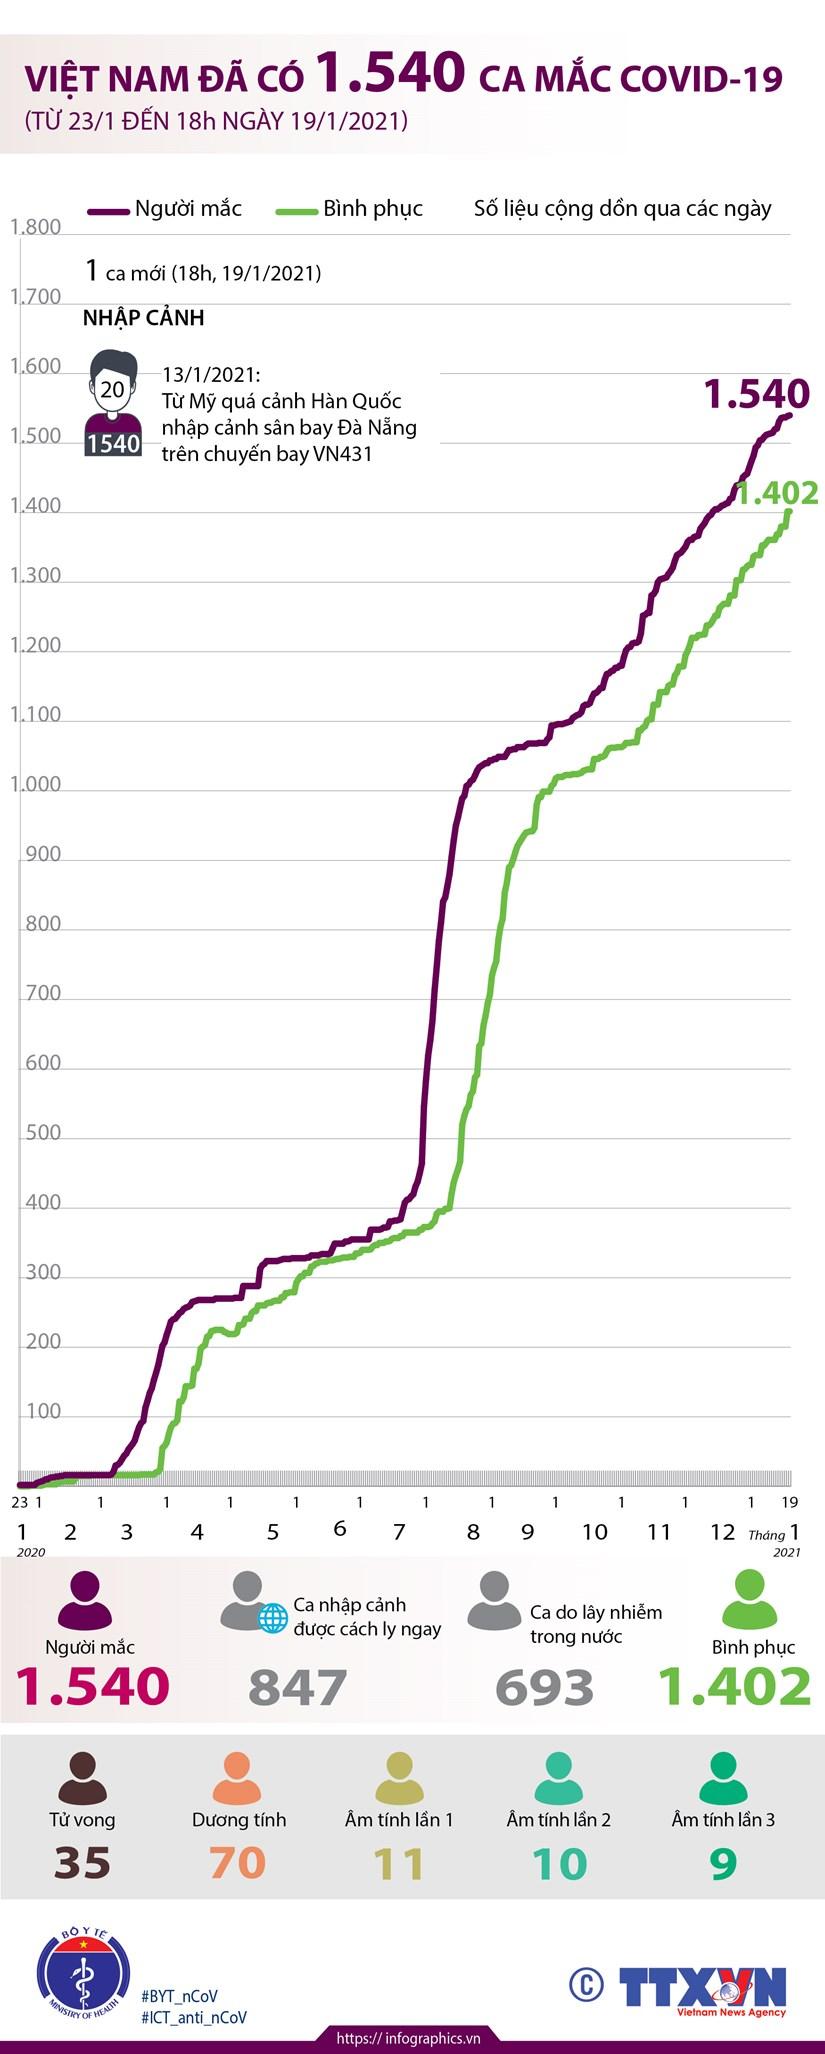 [Infographics] Viet Nam da ghi nhan 1.540 ca mac COVID-19 hinh anh 1